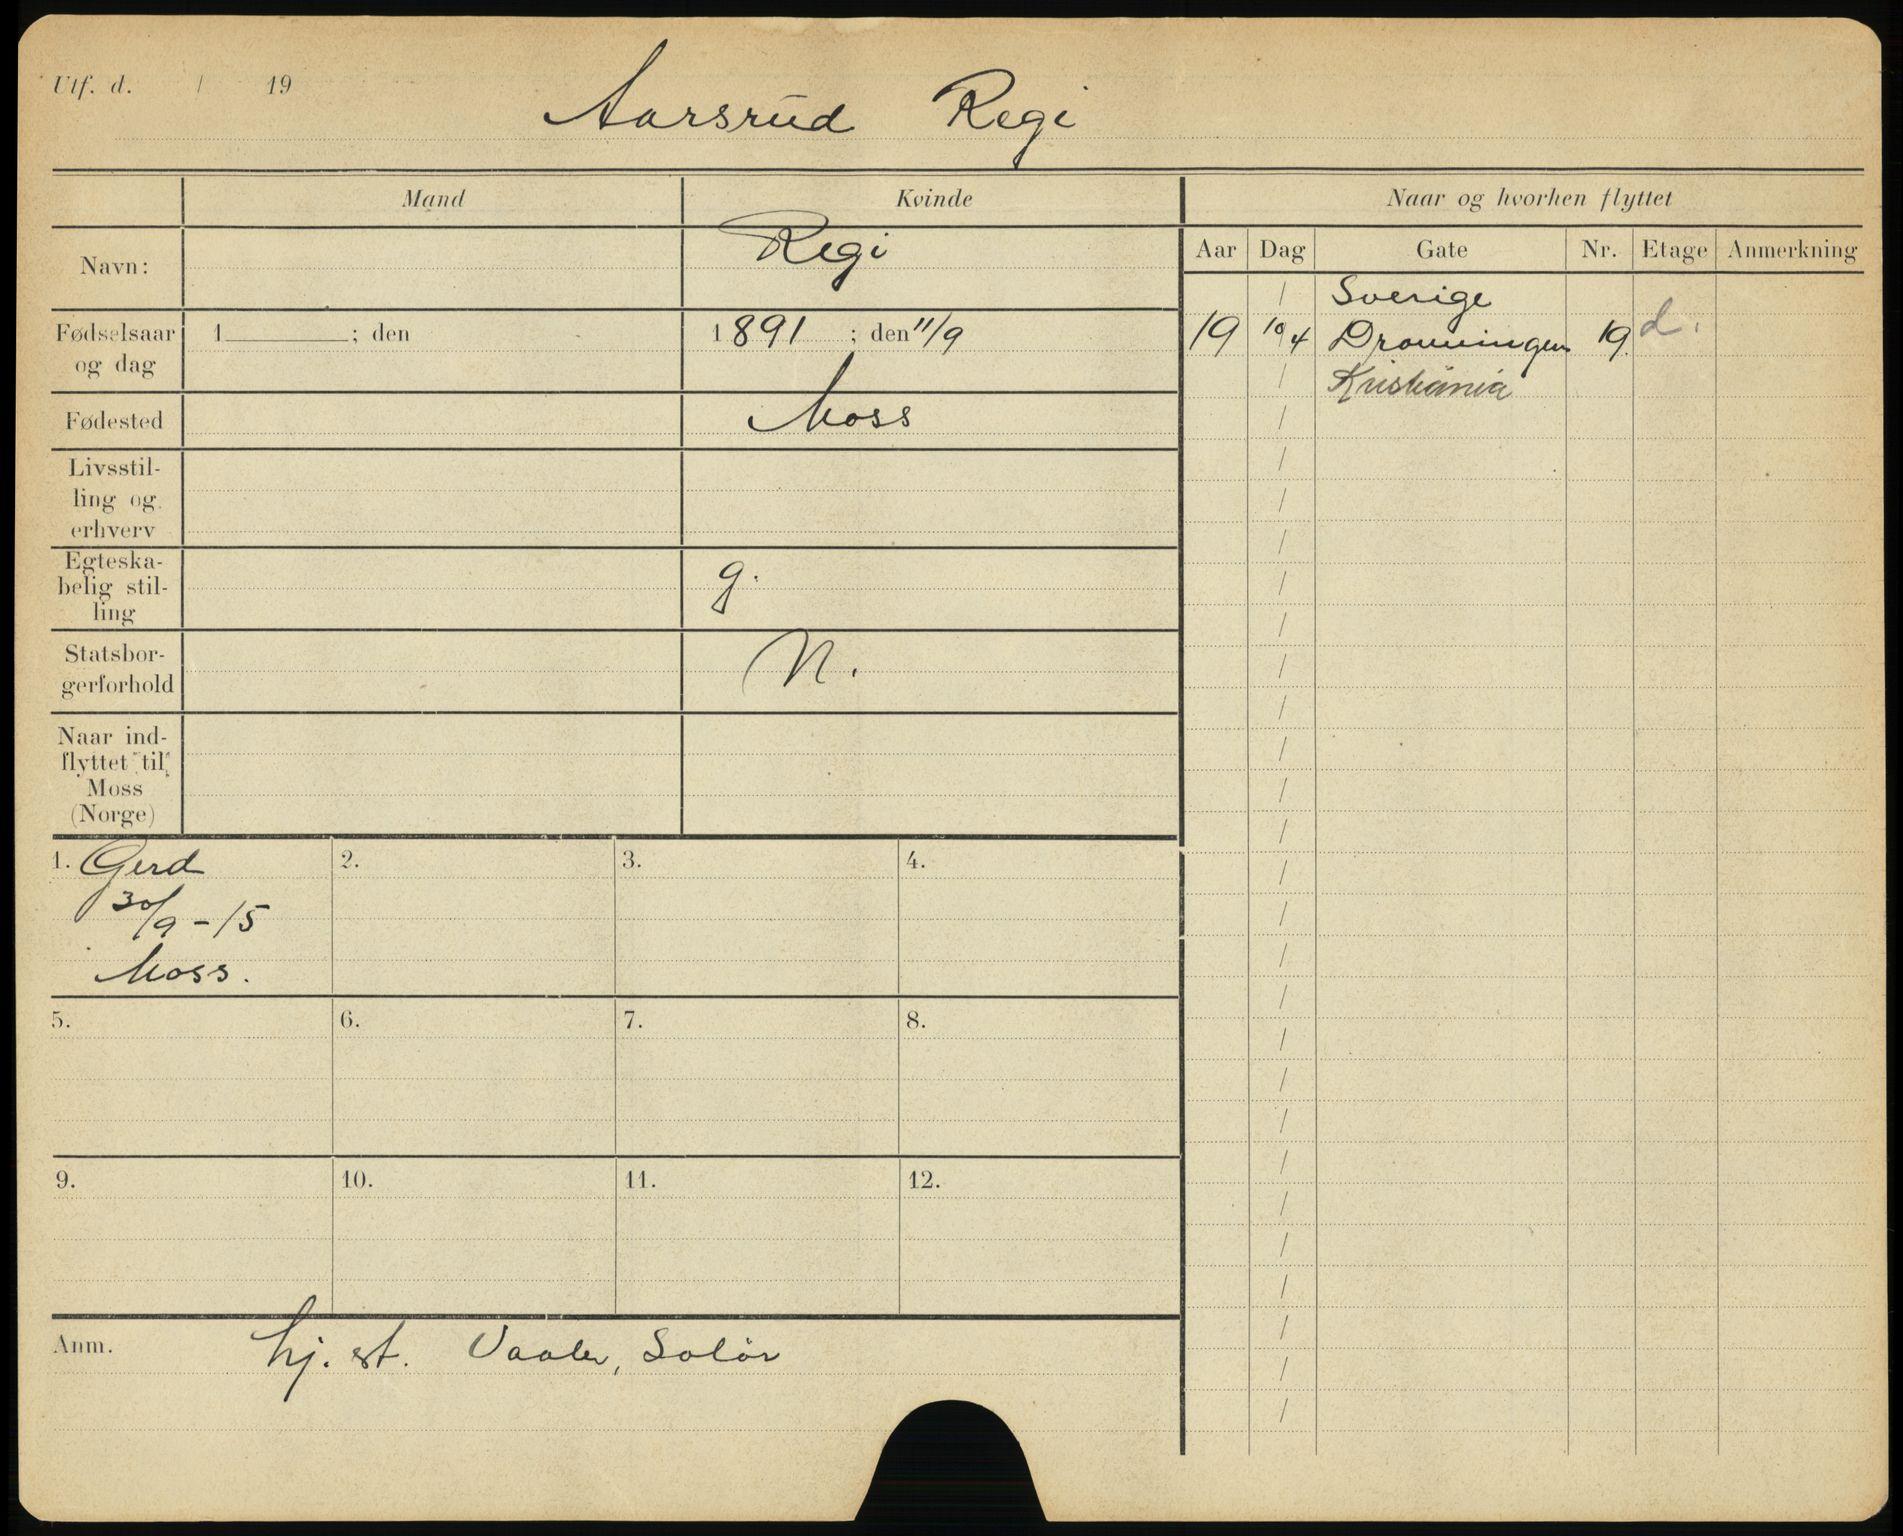 SAO, Moss folkeregister, F/L0004: Utflyttede, 1919-1920